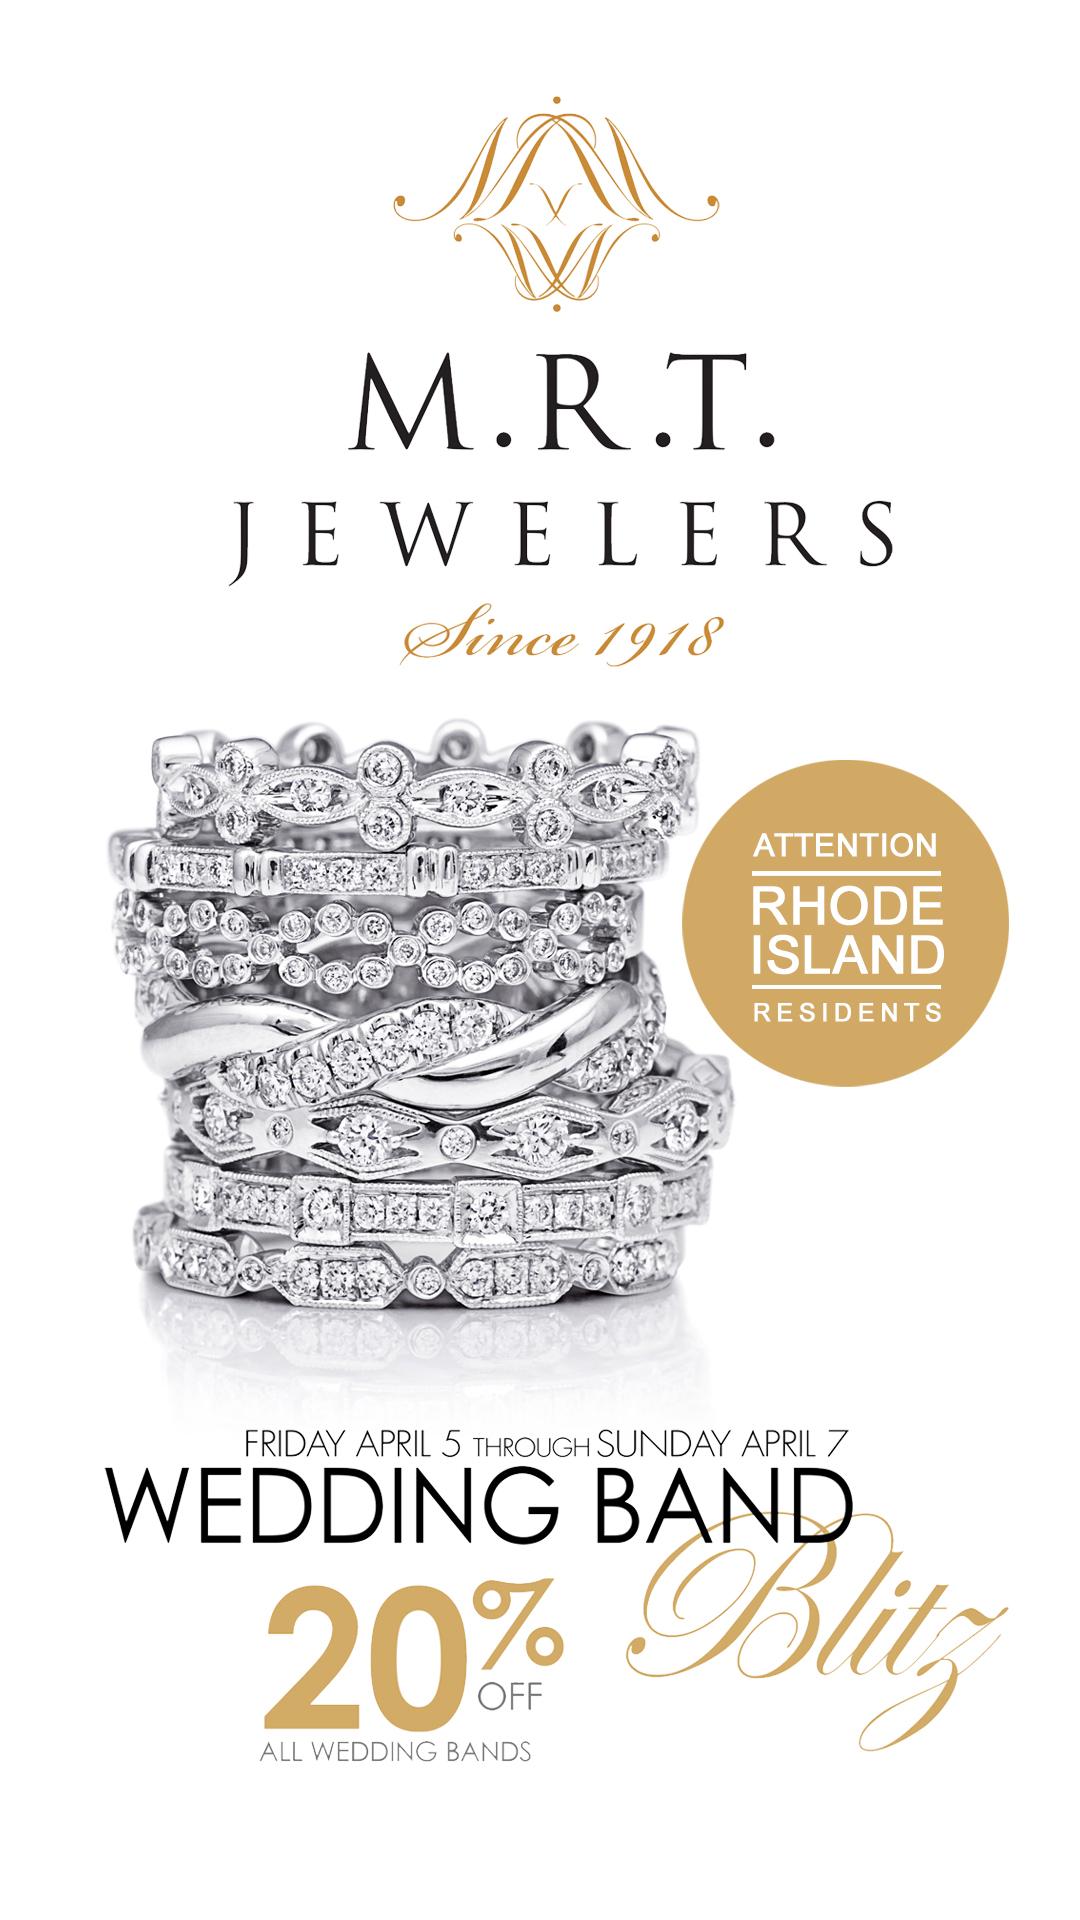 MRT Jewelers, East Providence Rhode Island | Wedding Band Blitz Event Featuring Coast Diamond!